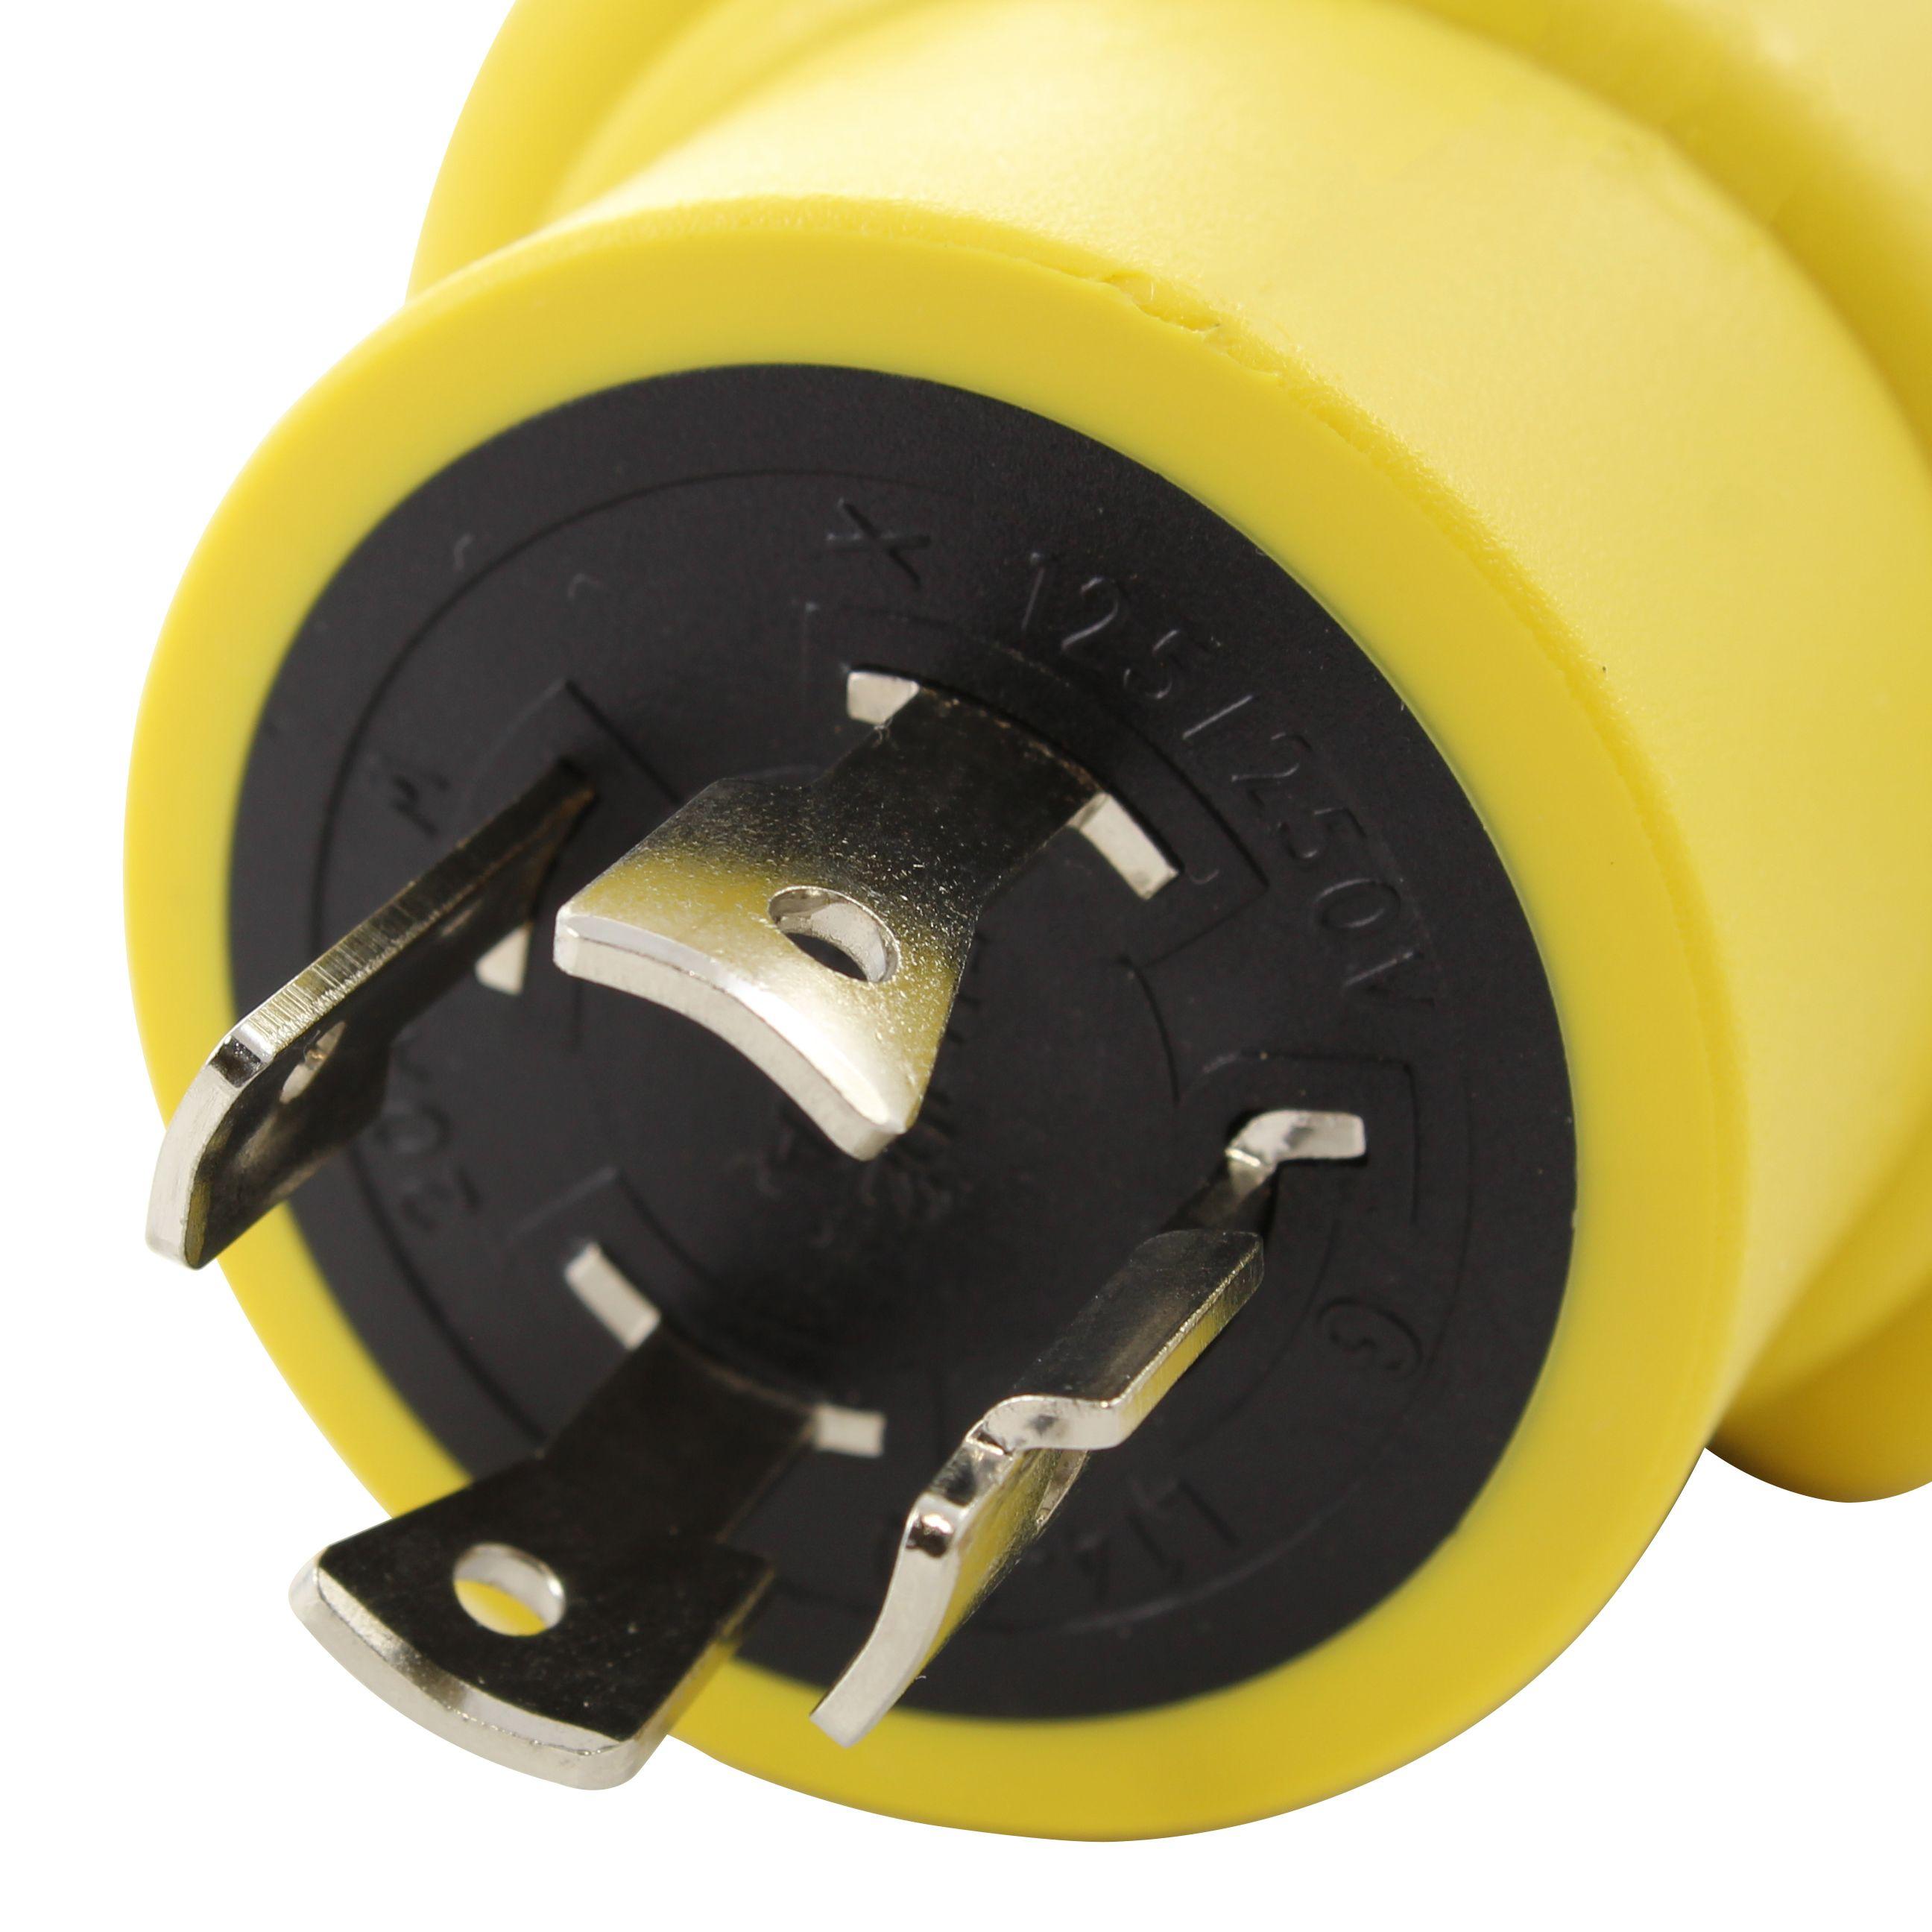 Ac Works Rvl14201450 Adapter Nema L14 20p 20a 4 Prong Plug To Nema 14 50r 50a 125 250v Connector Plugs Connector Compact Design